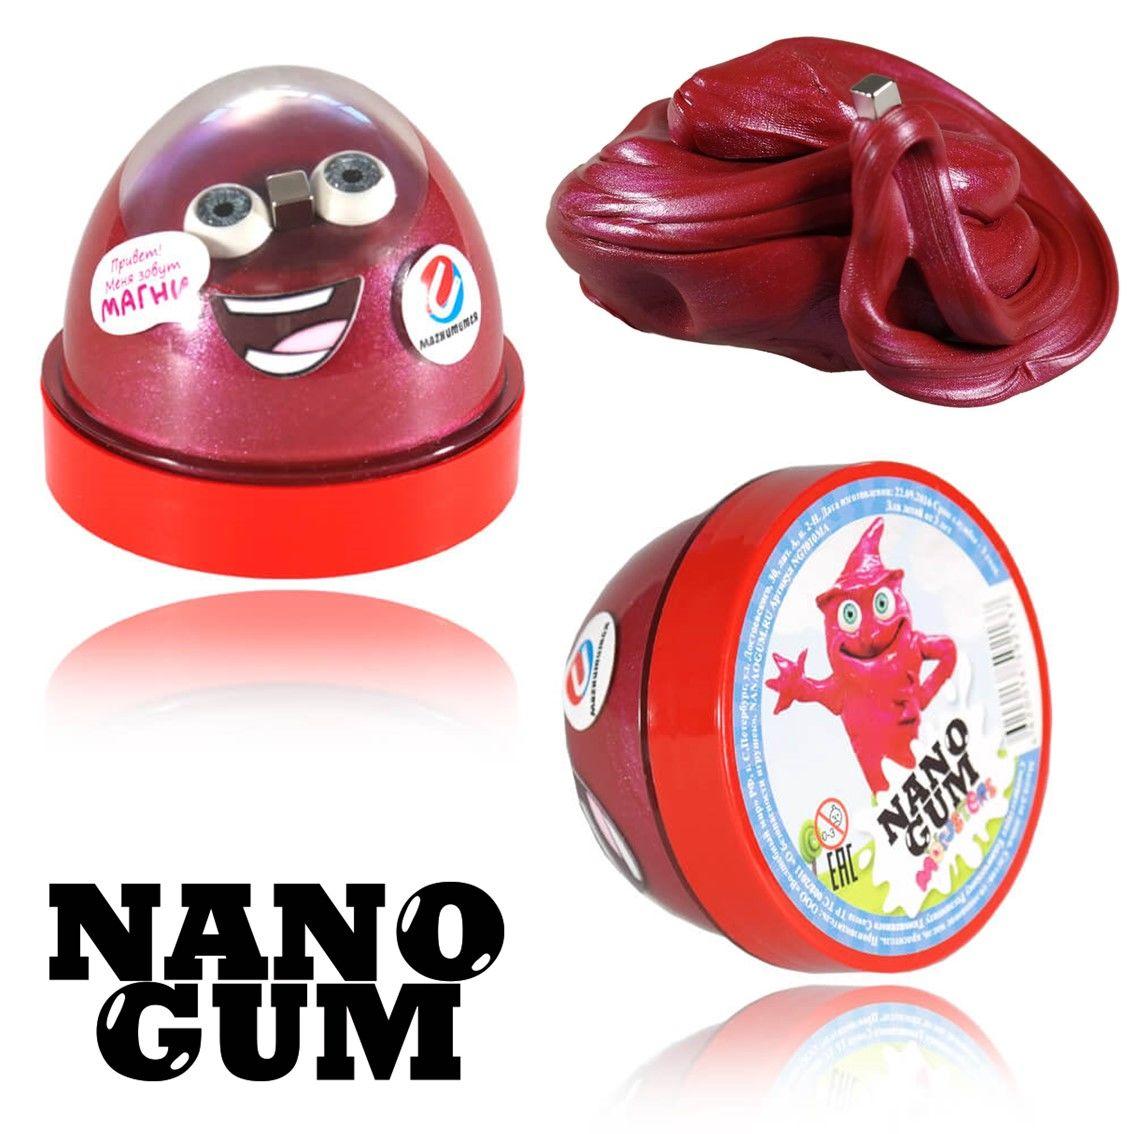 Жвачка для рук Nano gum Магни 50 гр